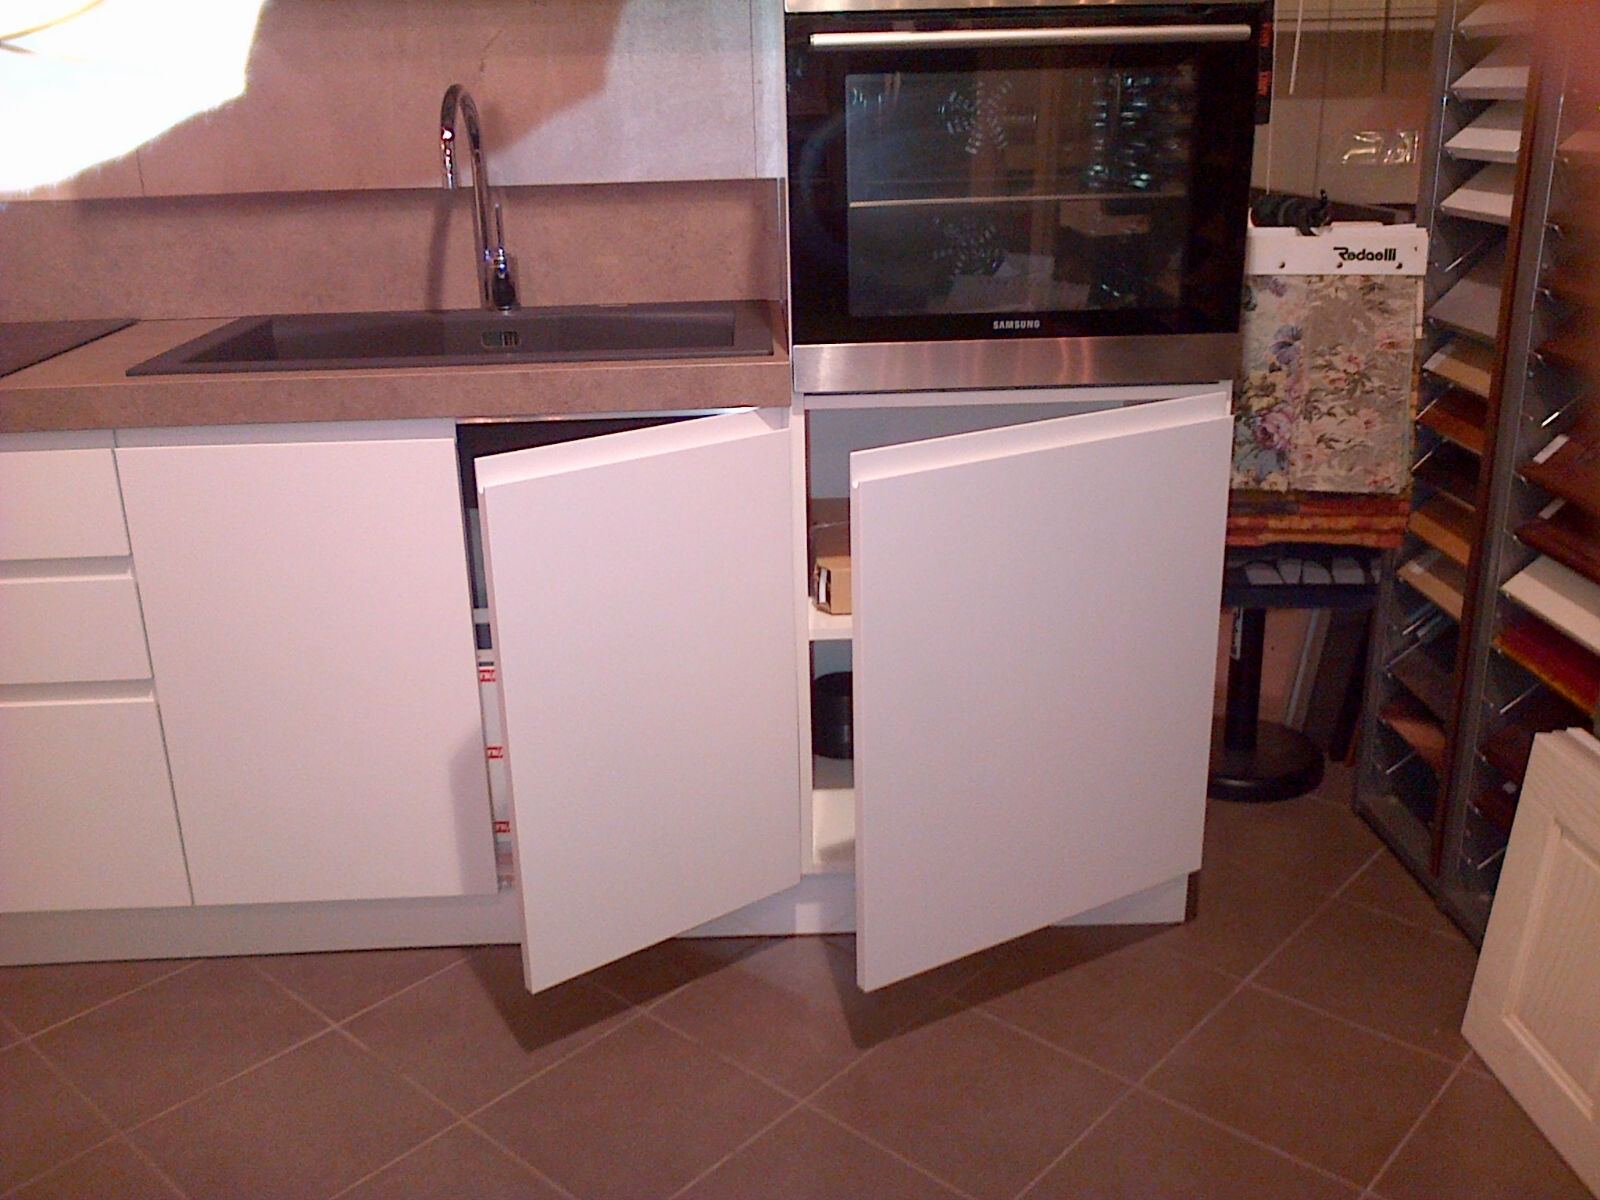 Cucina laccata bianca opaca modello arcobaleno di ar due cucine a prezzi scontati - Cucina bianca e marrone ...